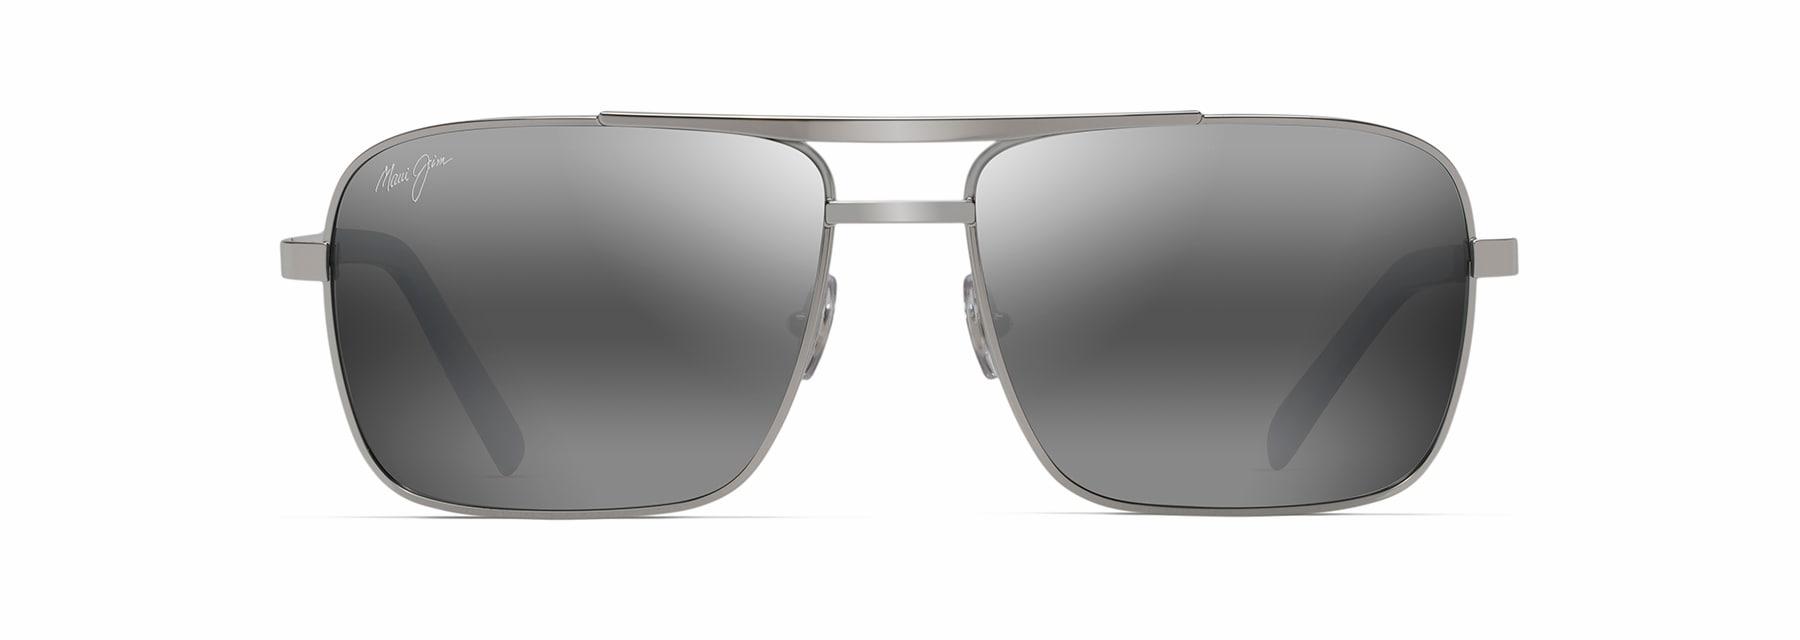 86003f4d6da6a COMPASS. Polarized Aviator Sunglasses